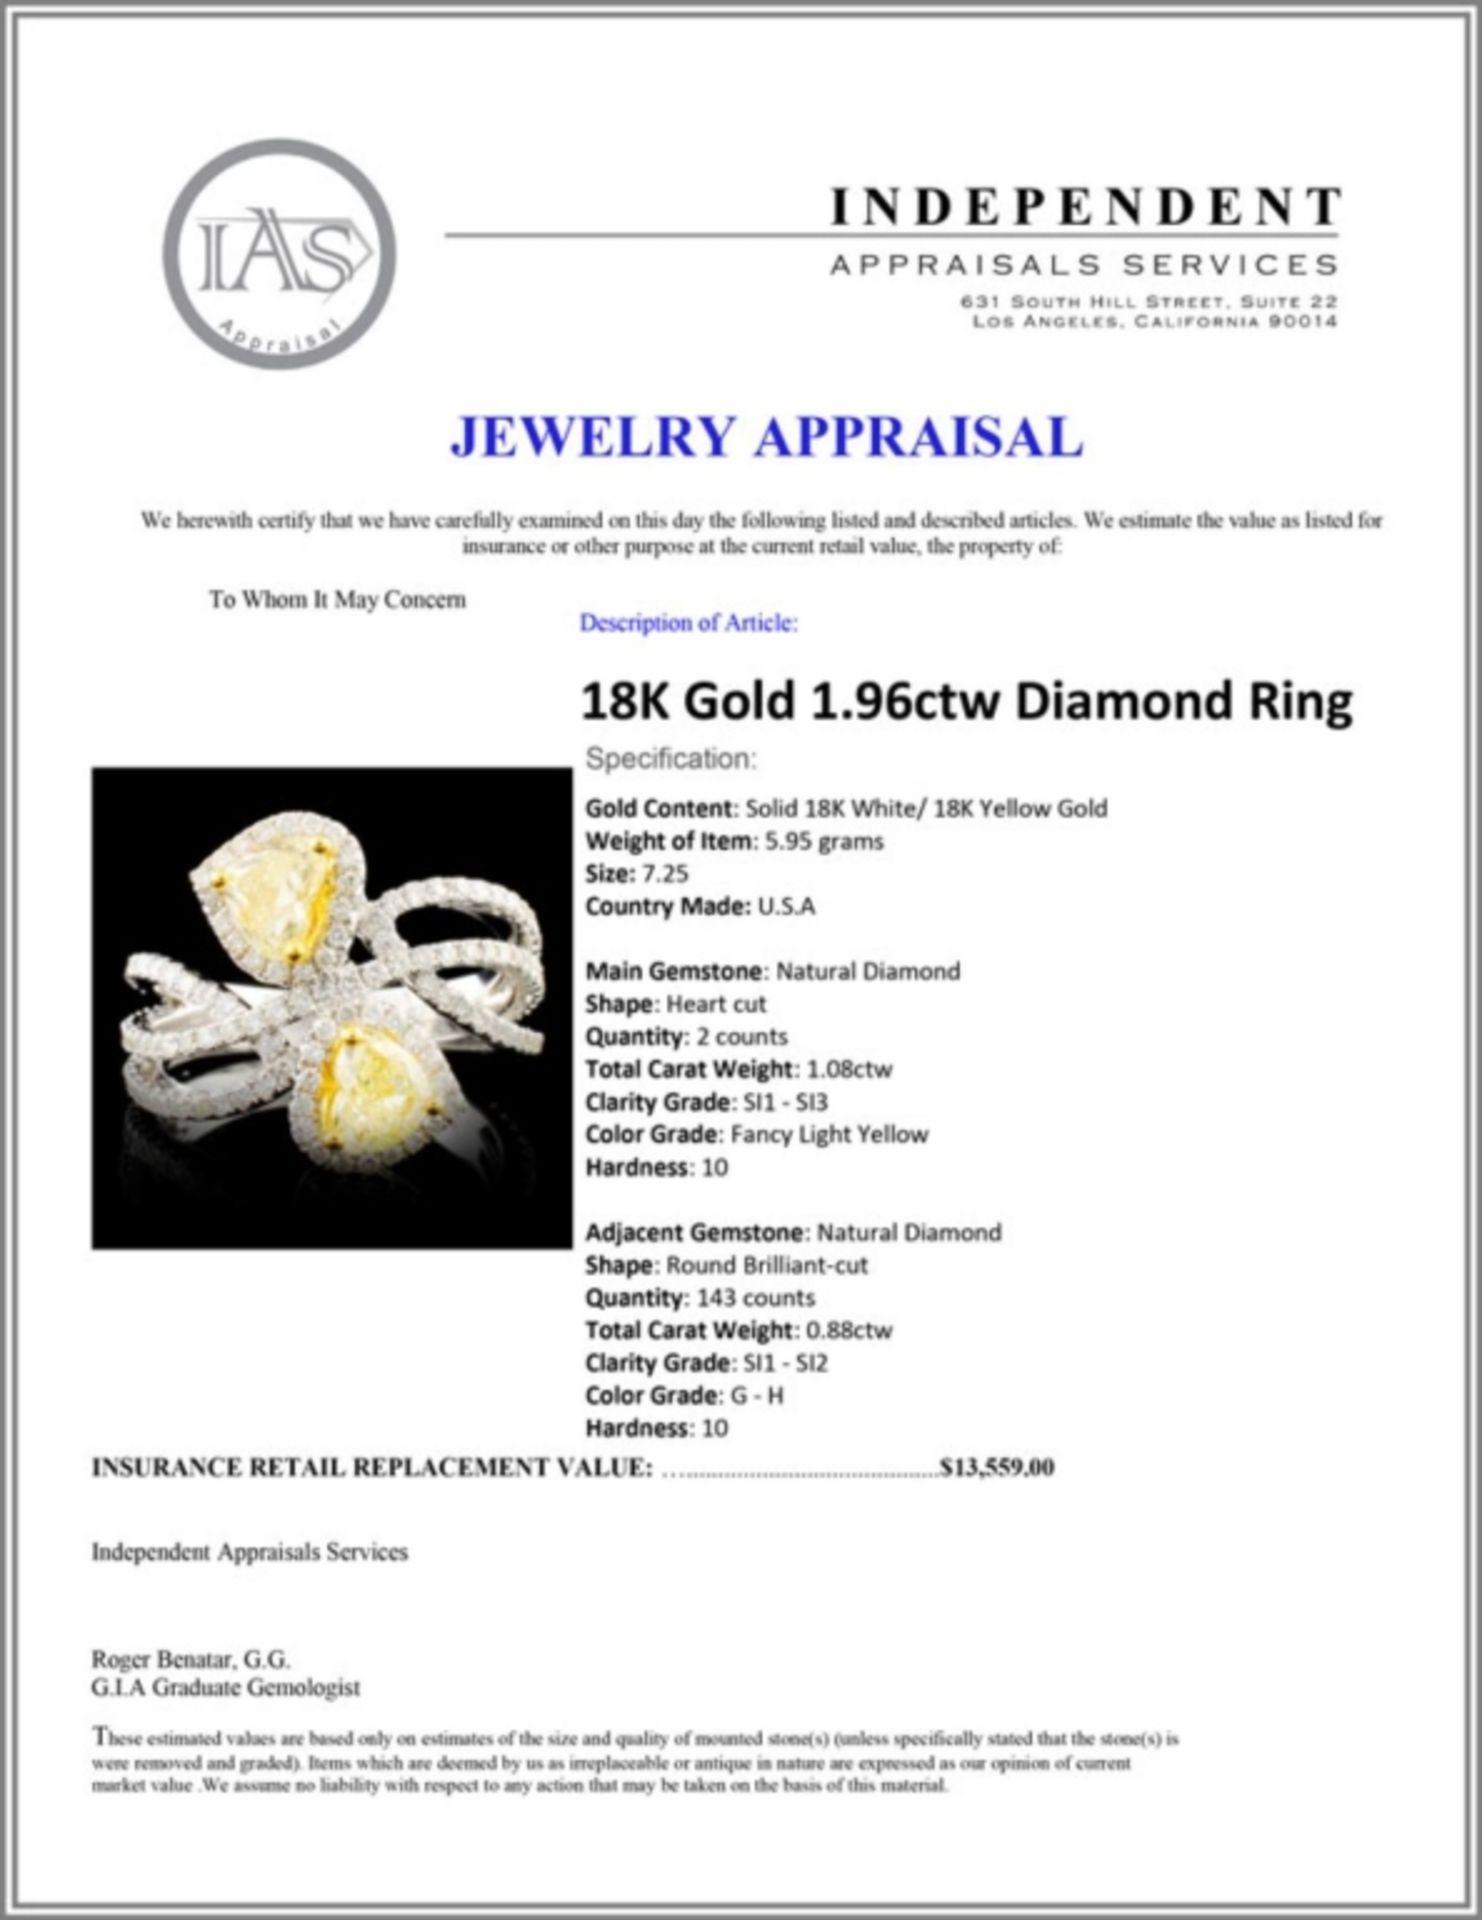 18K Gold 1.96ctw Diamond Ring - Image 5 of 5